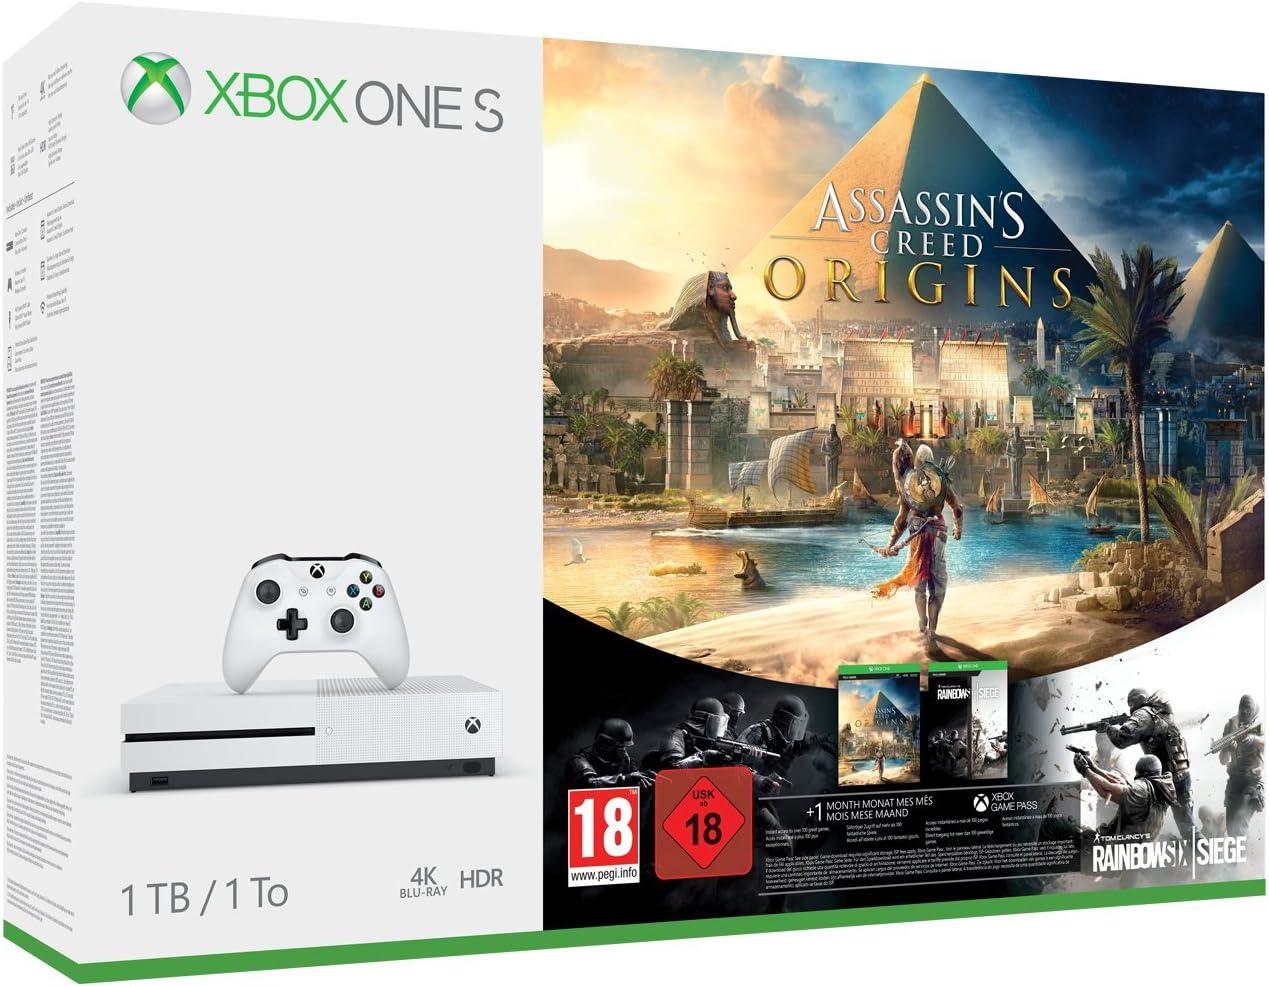 Xbox One S 1TB Console - Assassins Creed Origins Bonus Bundle ...